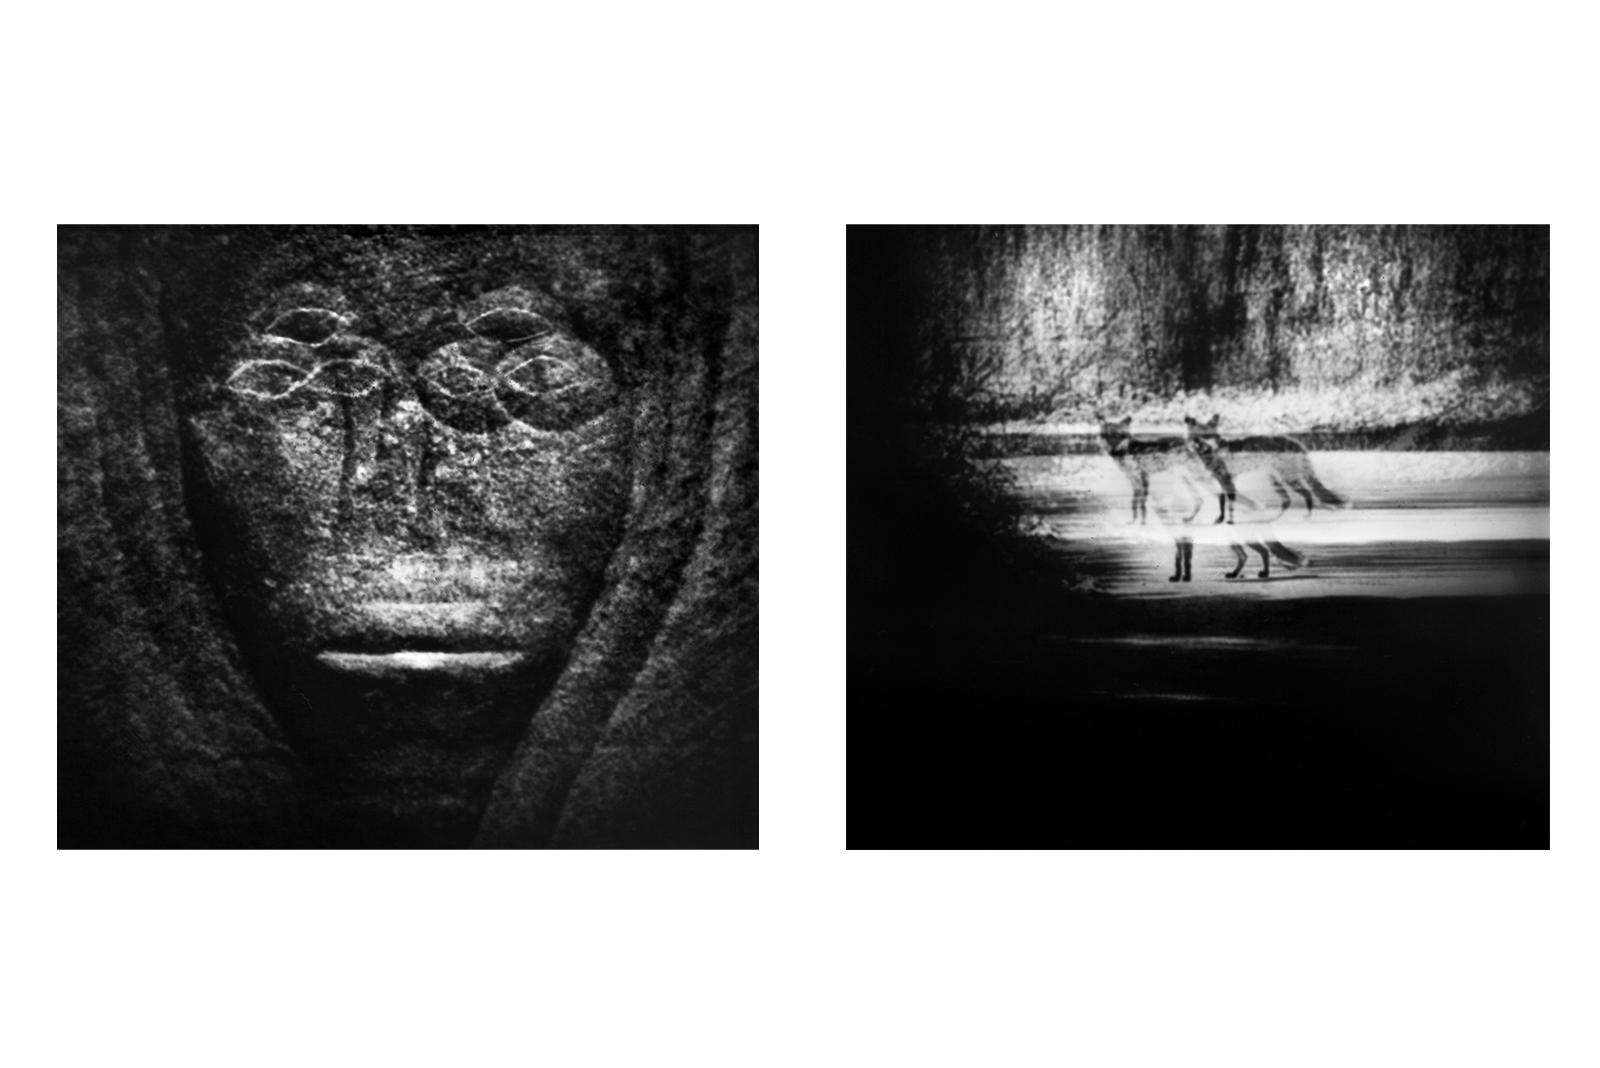 Gaetano de Crecchio, «Archeology», Deconstruction. //Gaetano de Crecchio, «Wilness&Lie», Deconstruction.